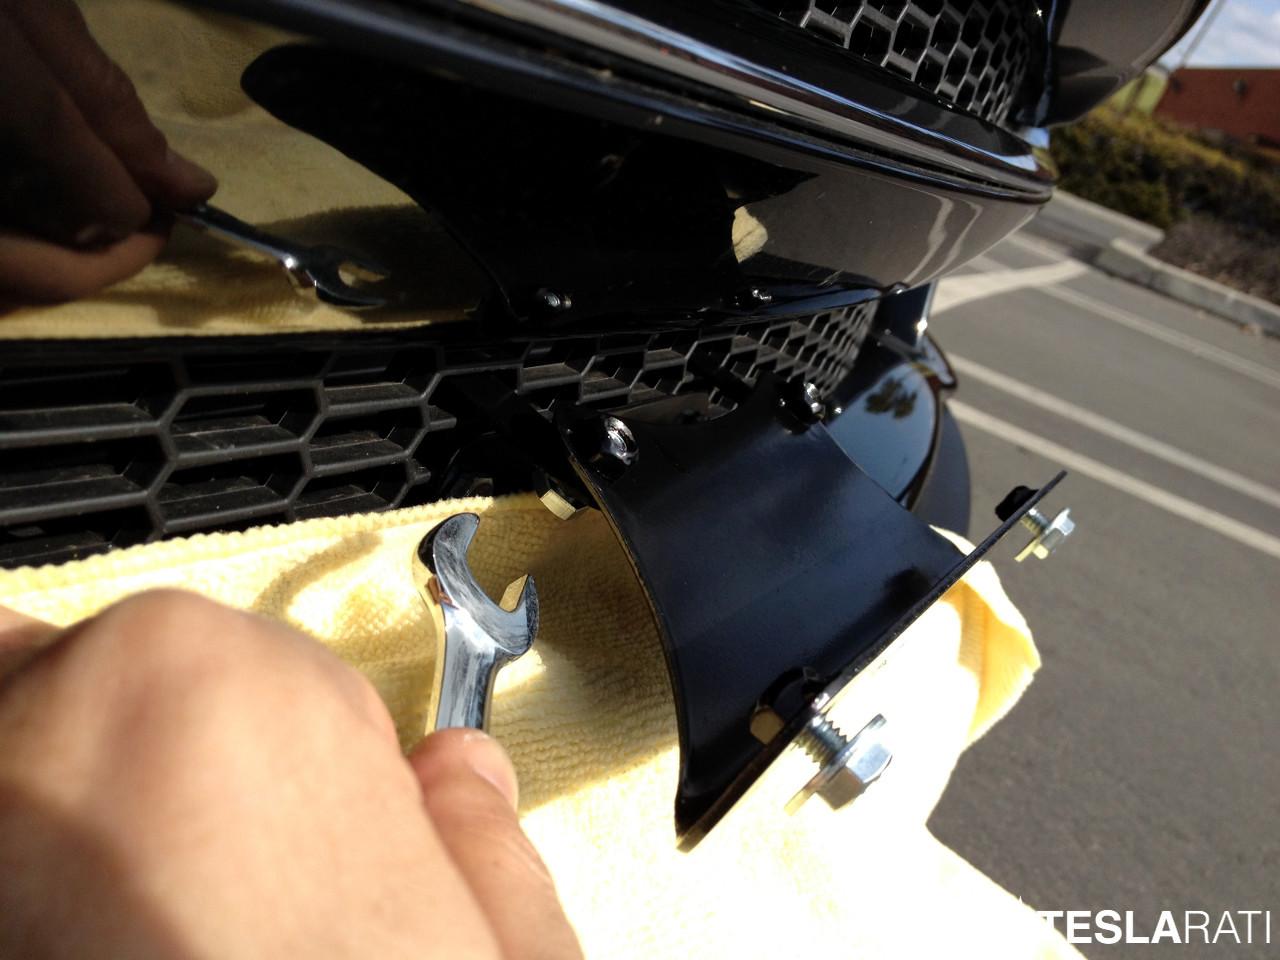 Torklift-Font-Base-Plate-Wrench